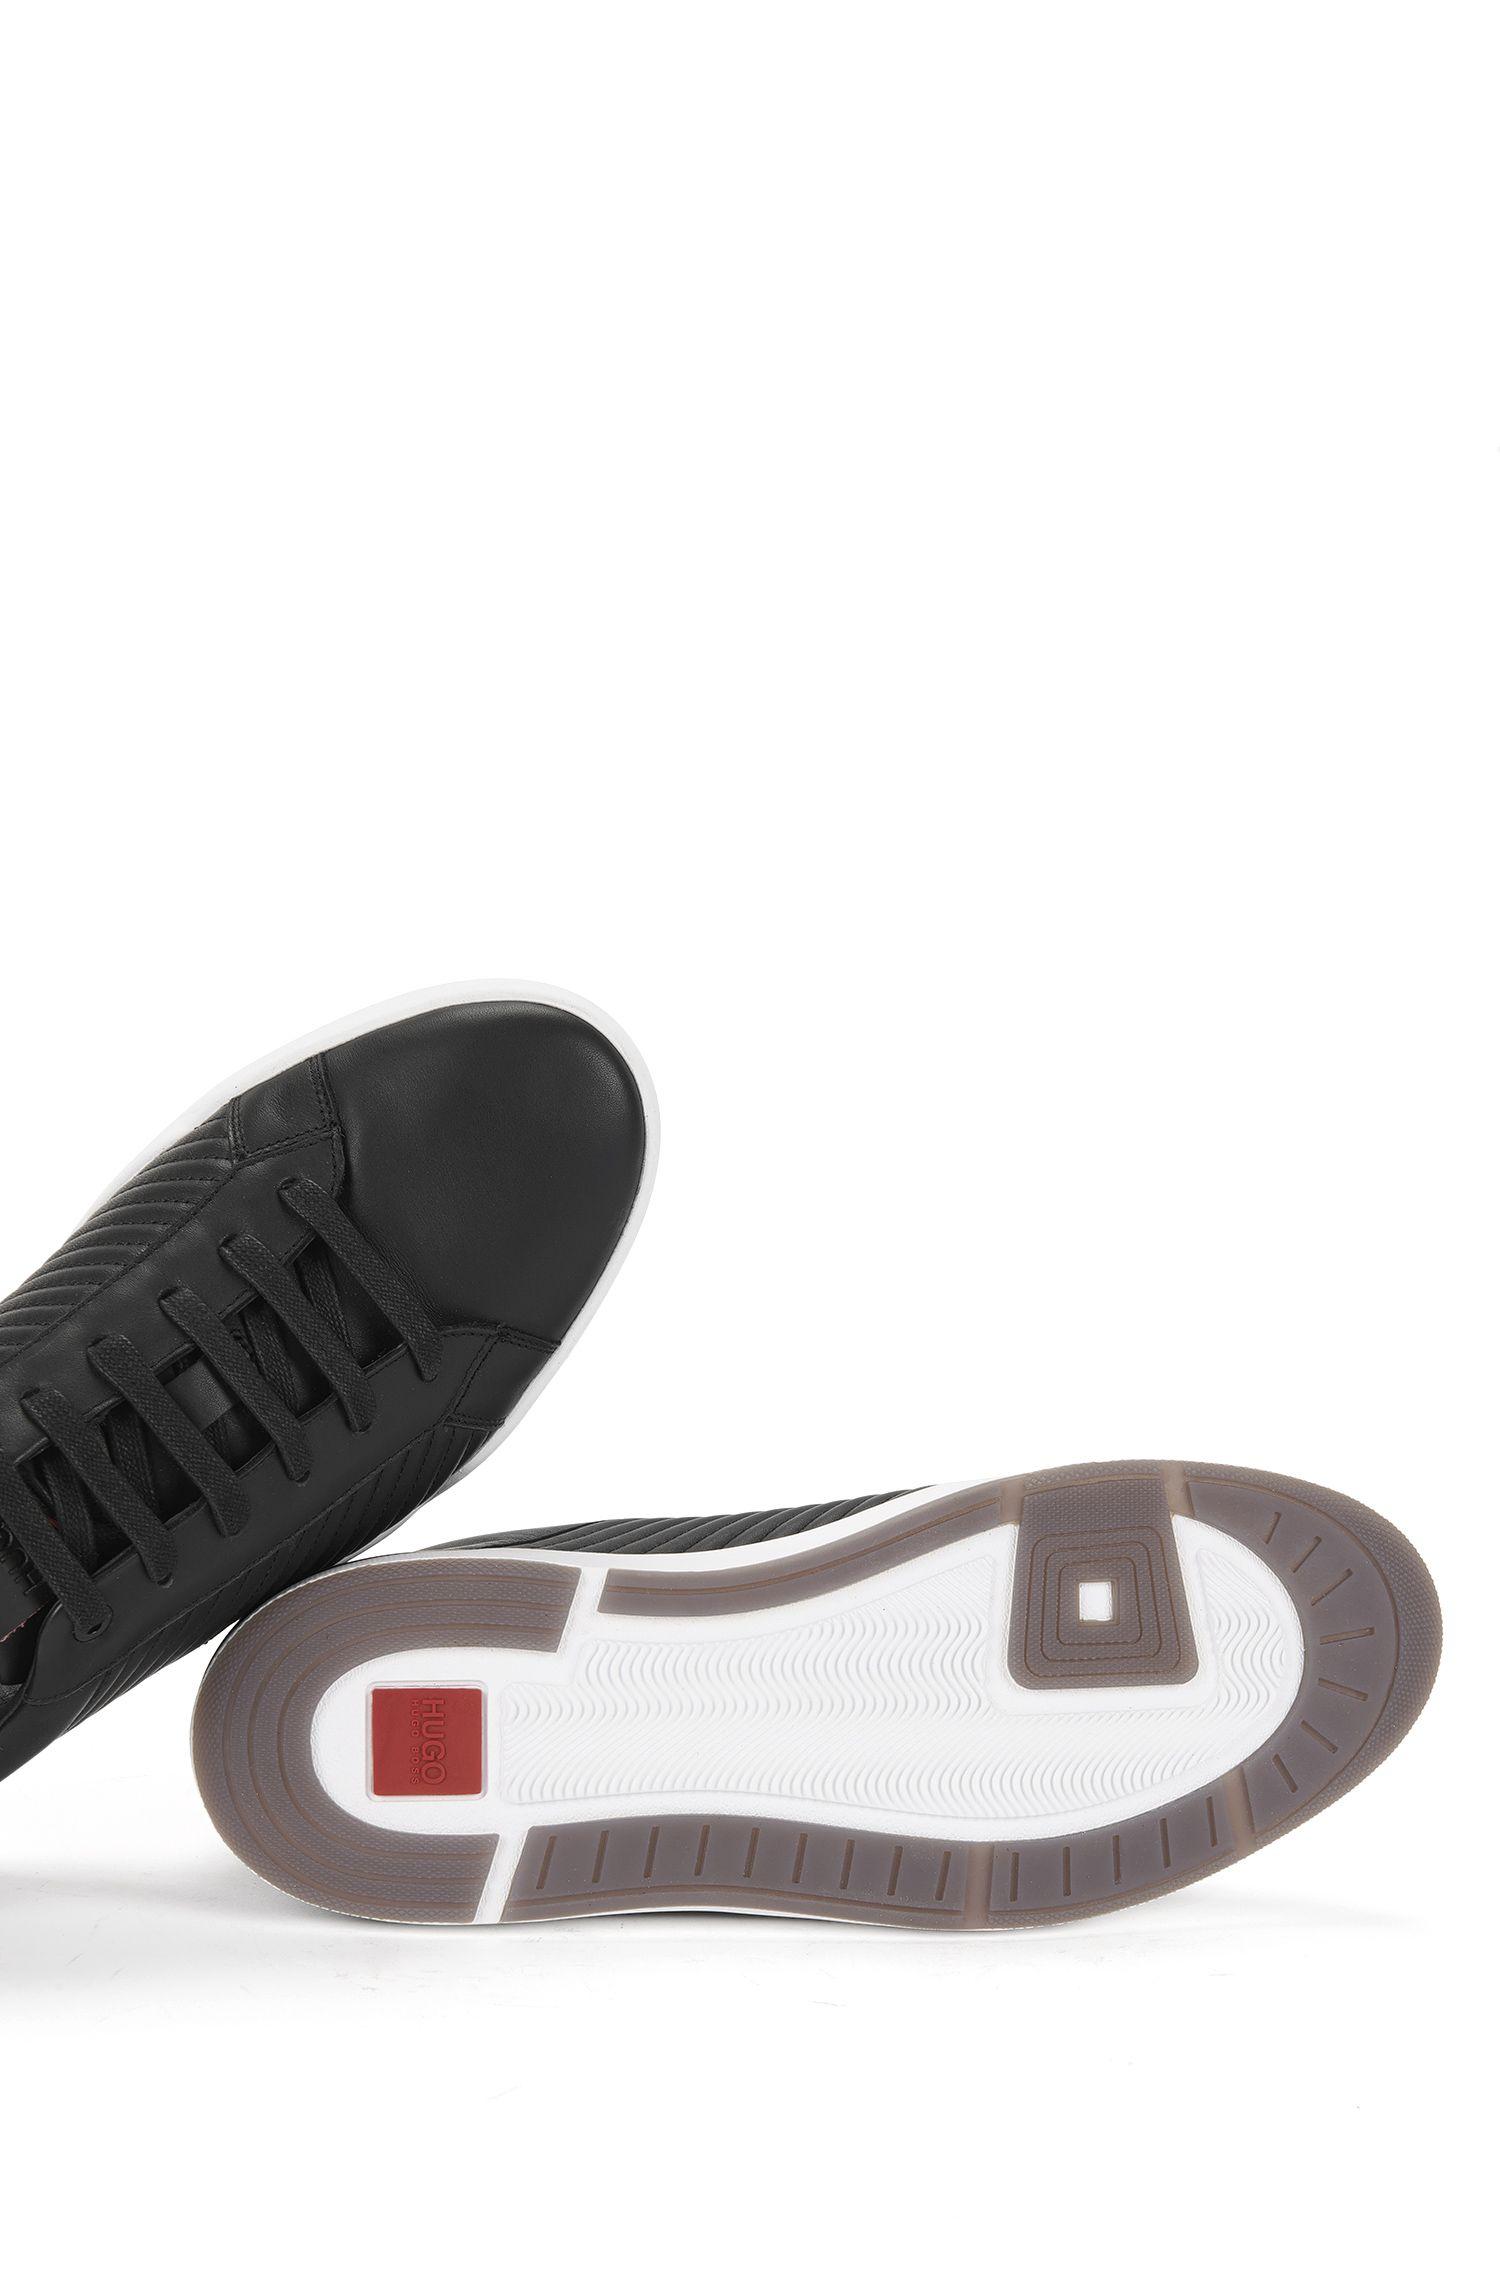 Sneakers aus Leder mit Steppnähten: 'Fusion_Tenn_Itma'